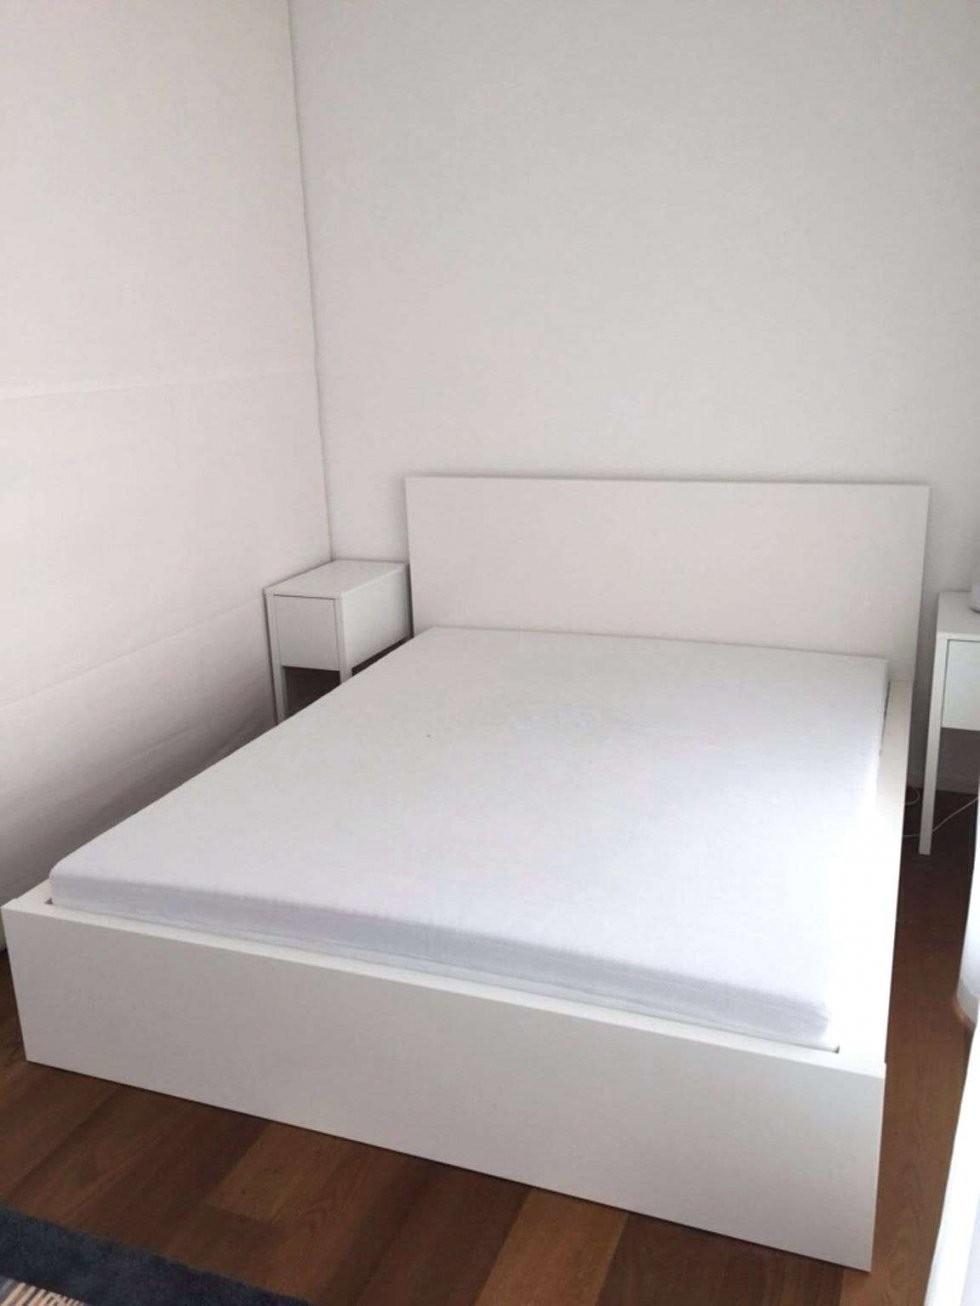 Ikea Malm Bett 140X200 Weiss Entwurf Bett Weiß 140X200  1291Swizz von Malm Bett 140X200 Weiß Bild